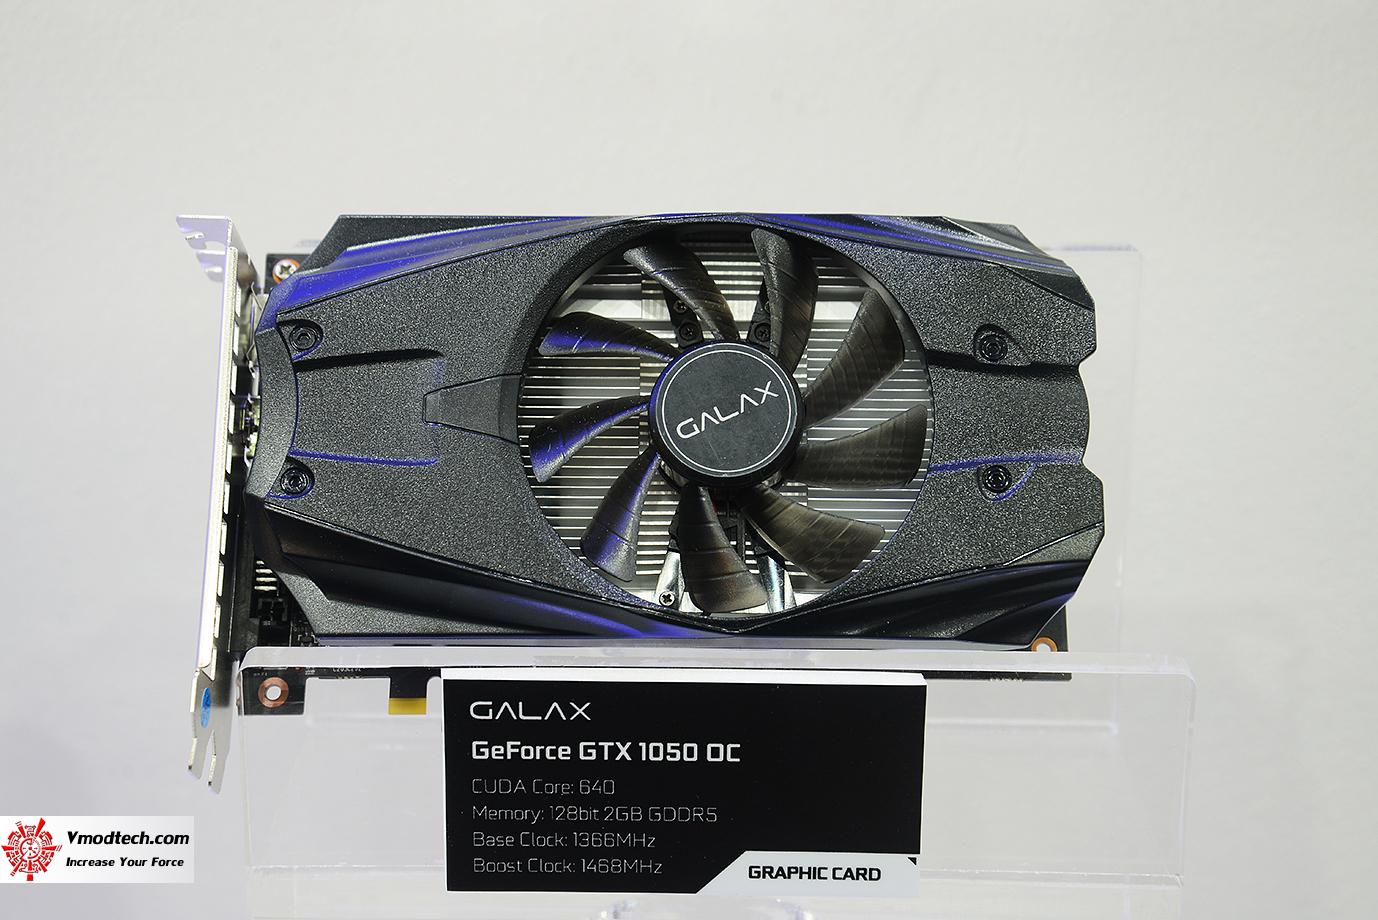 dsc 3348 Visit GALAX Booth @ Computex 2018